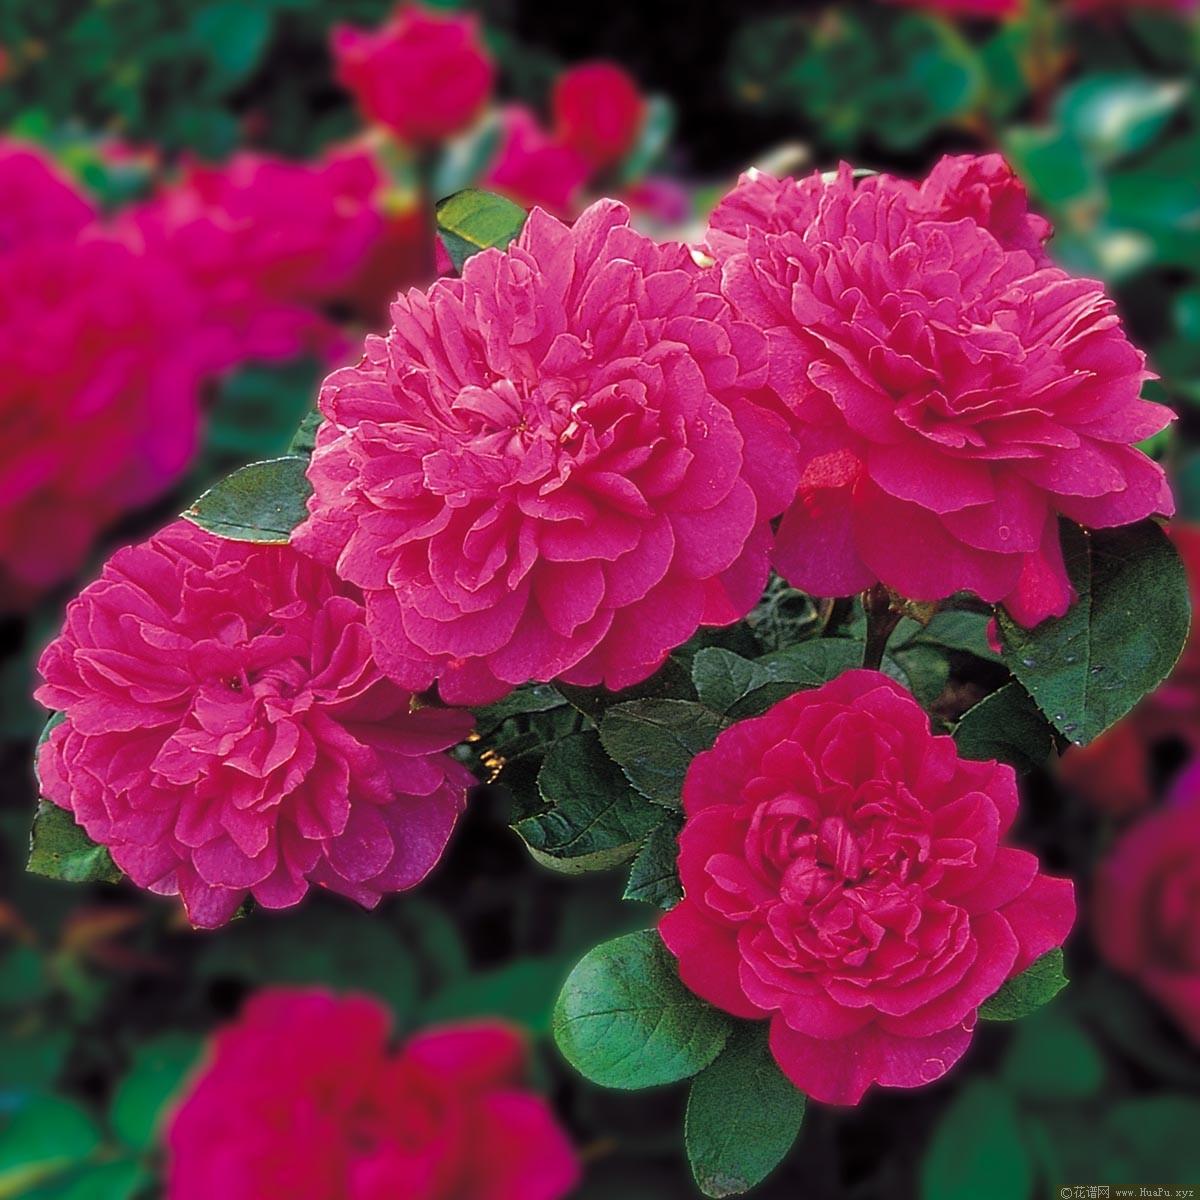 苏菲的玫瑰Sophy s Rose